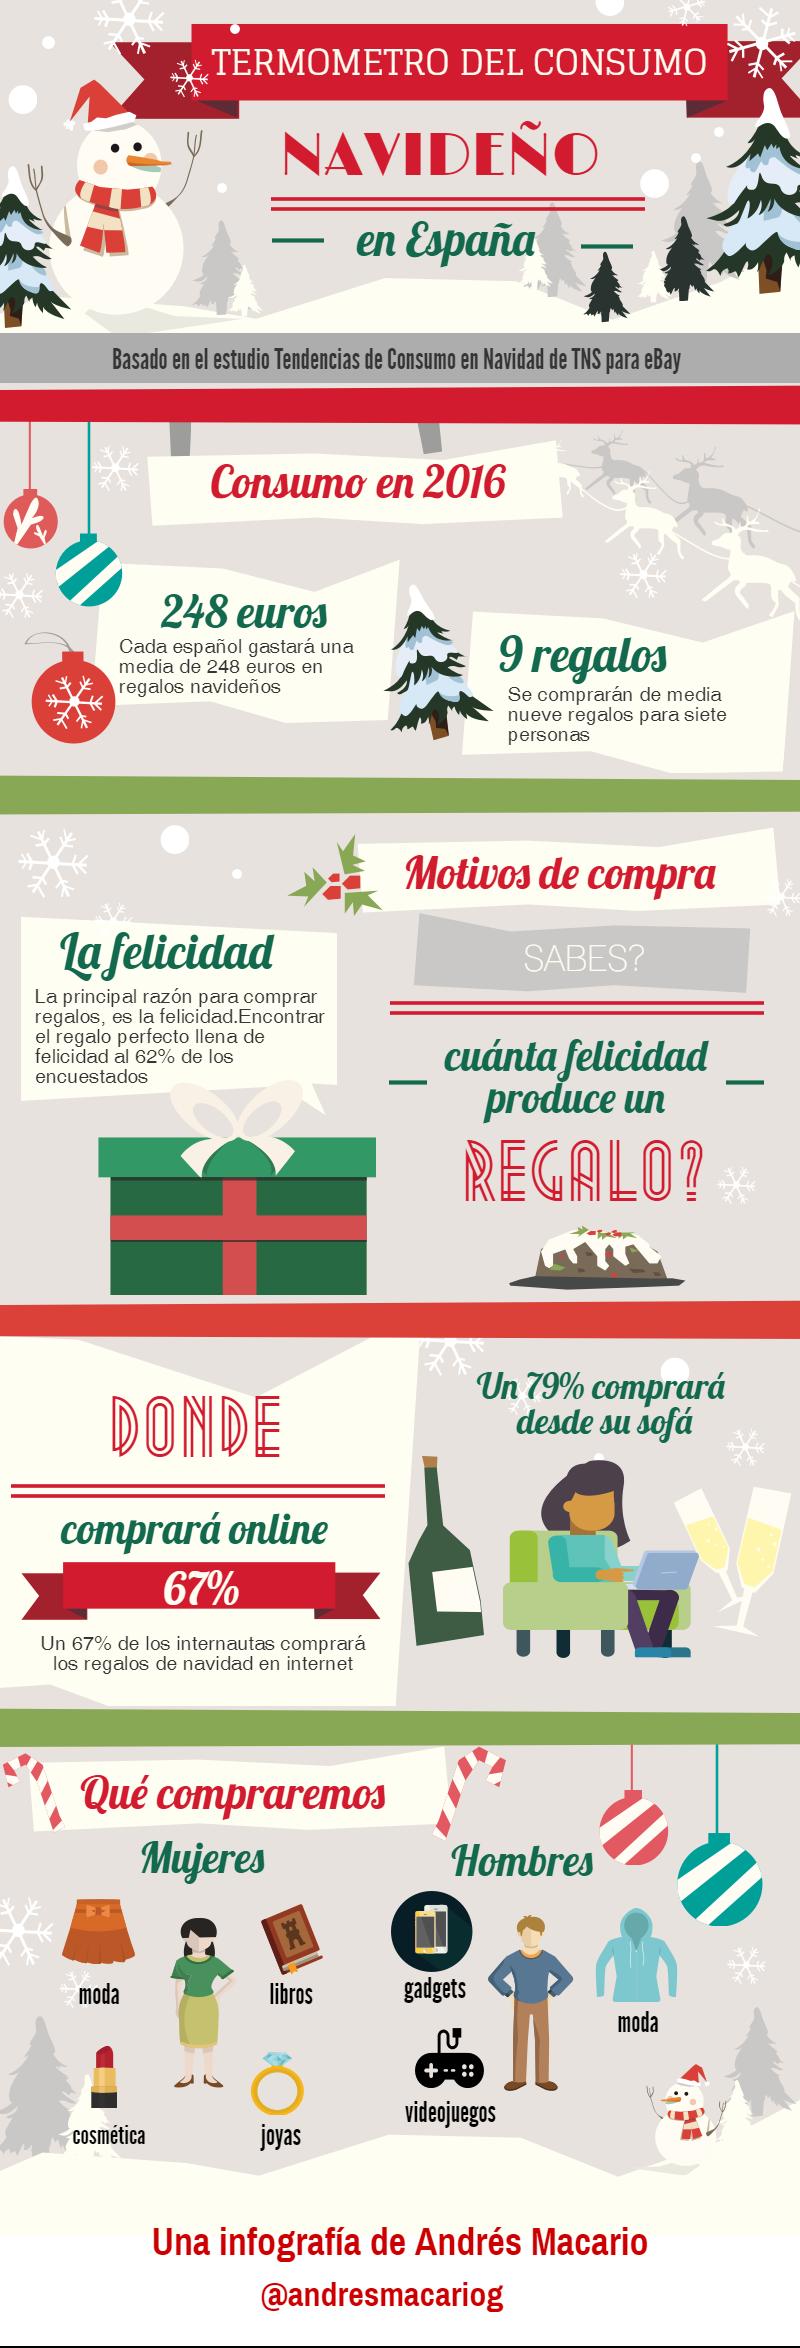 termometro-del-consumo-navideno-en-espana-infografia-andres-macario